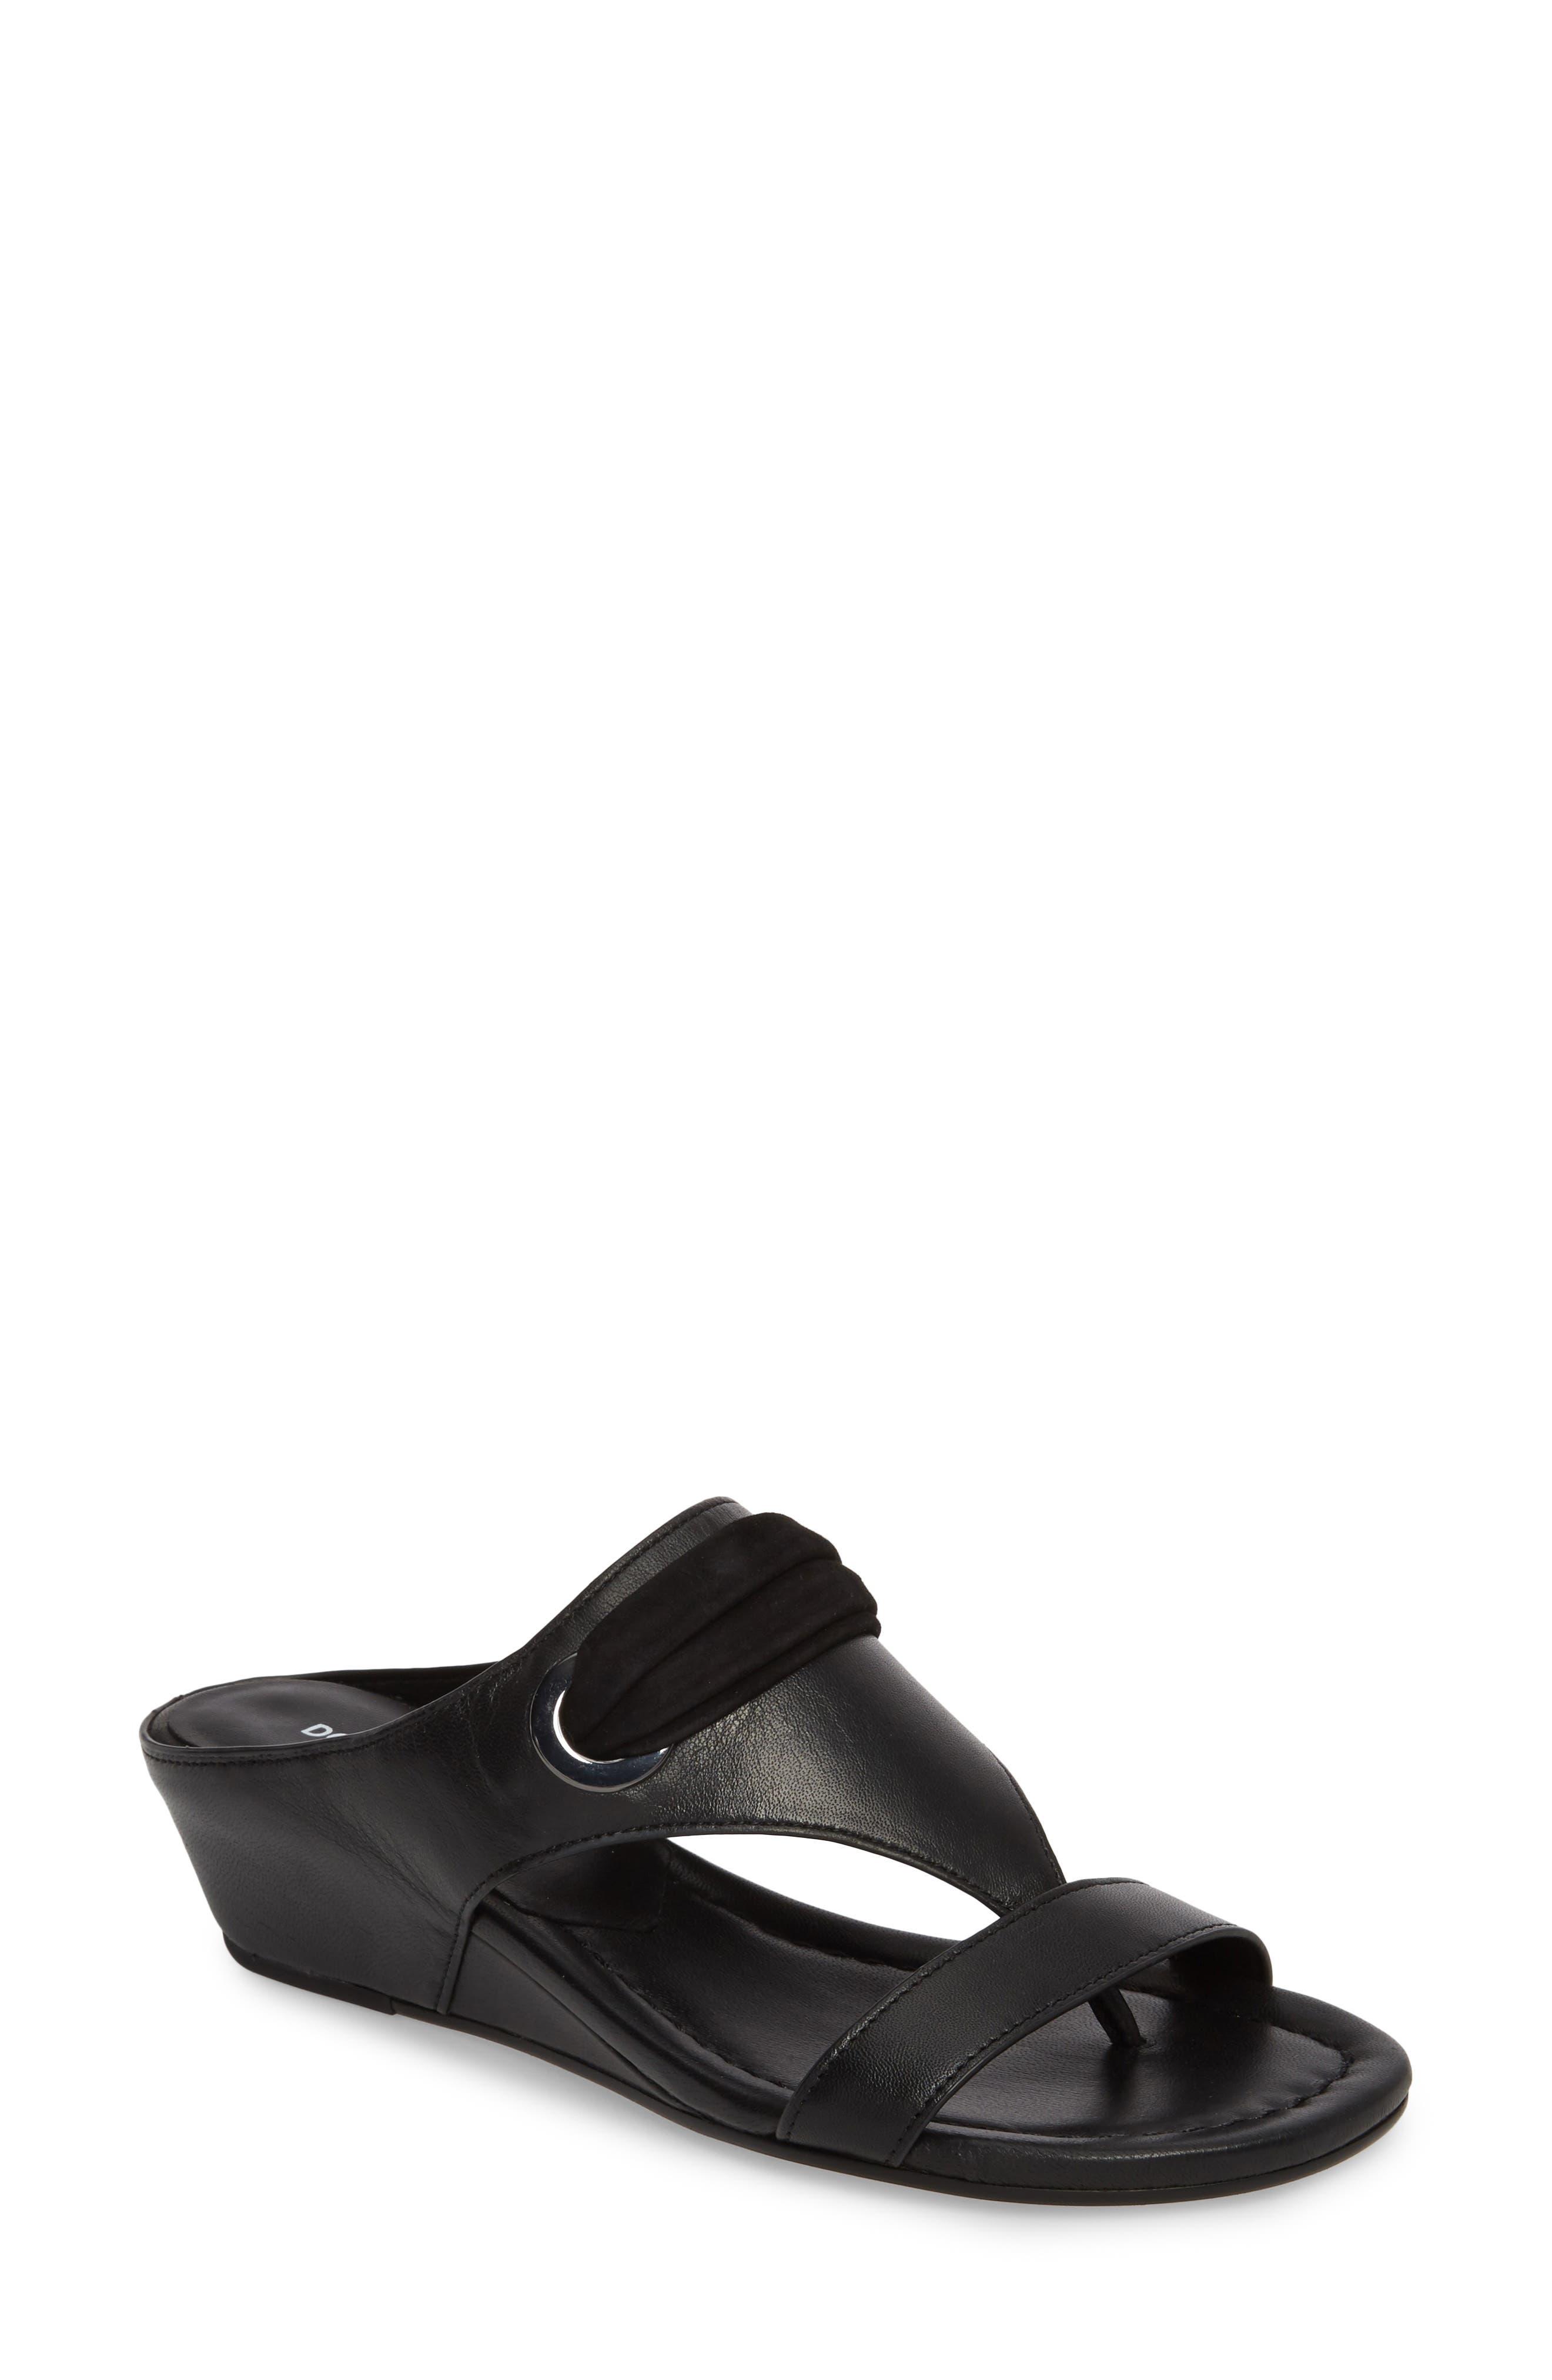 Dionne Wedge Sandal,                         Main,                         color, Black Leather